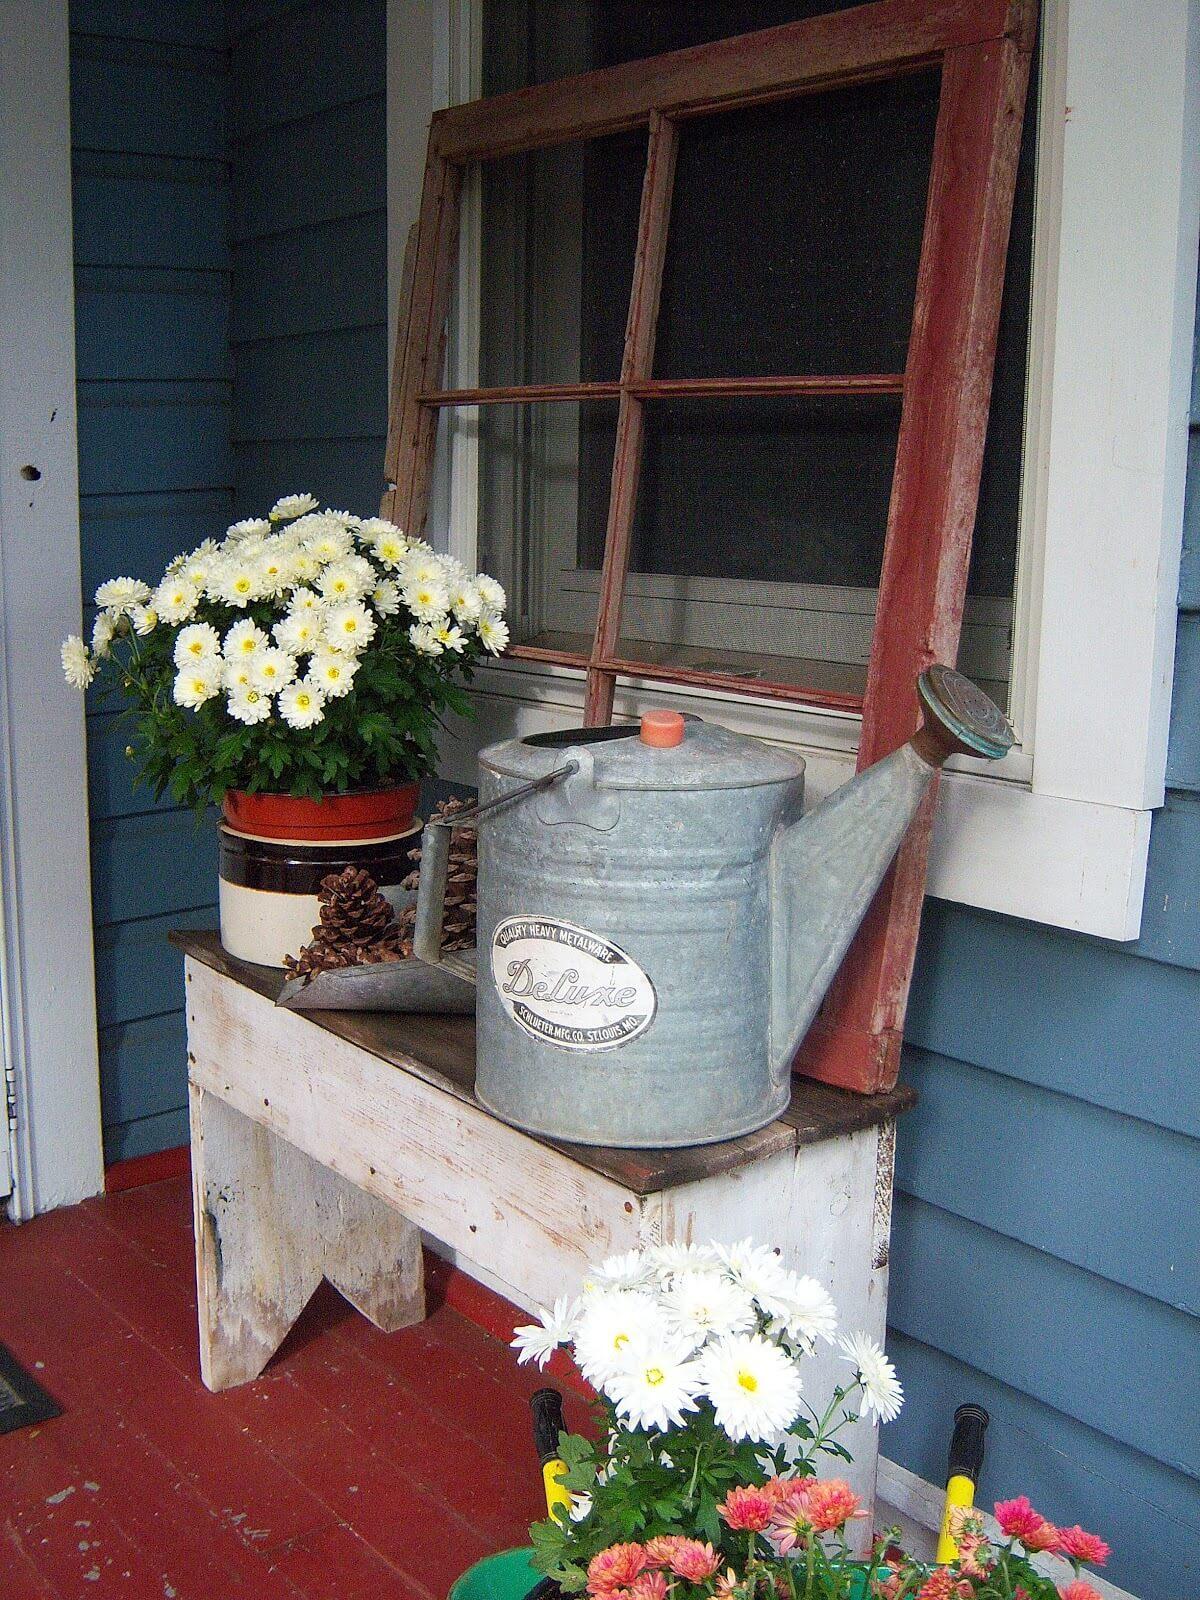 Antique and Rustic Vintage Porch Display